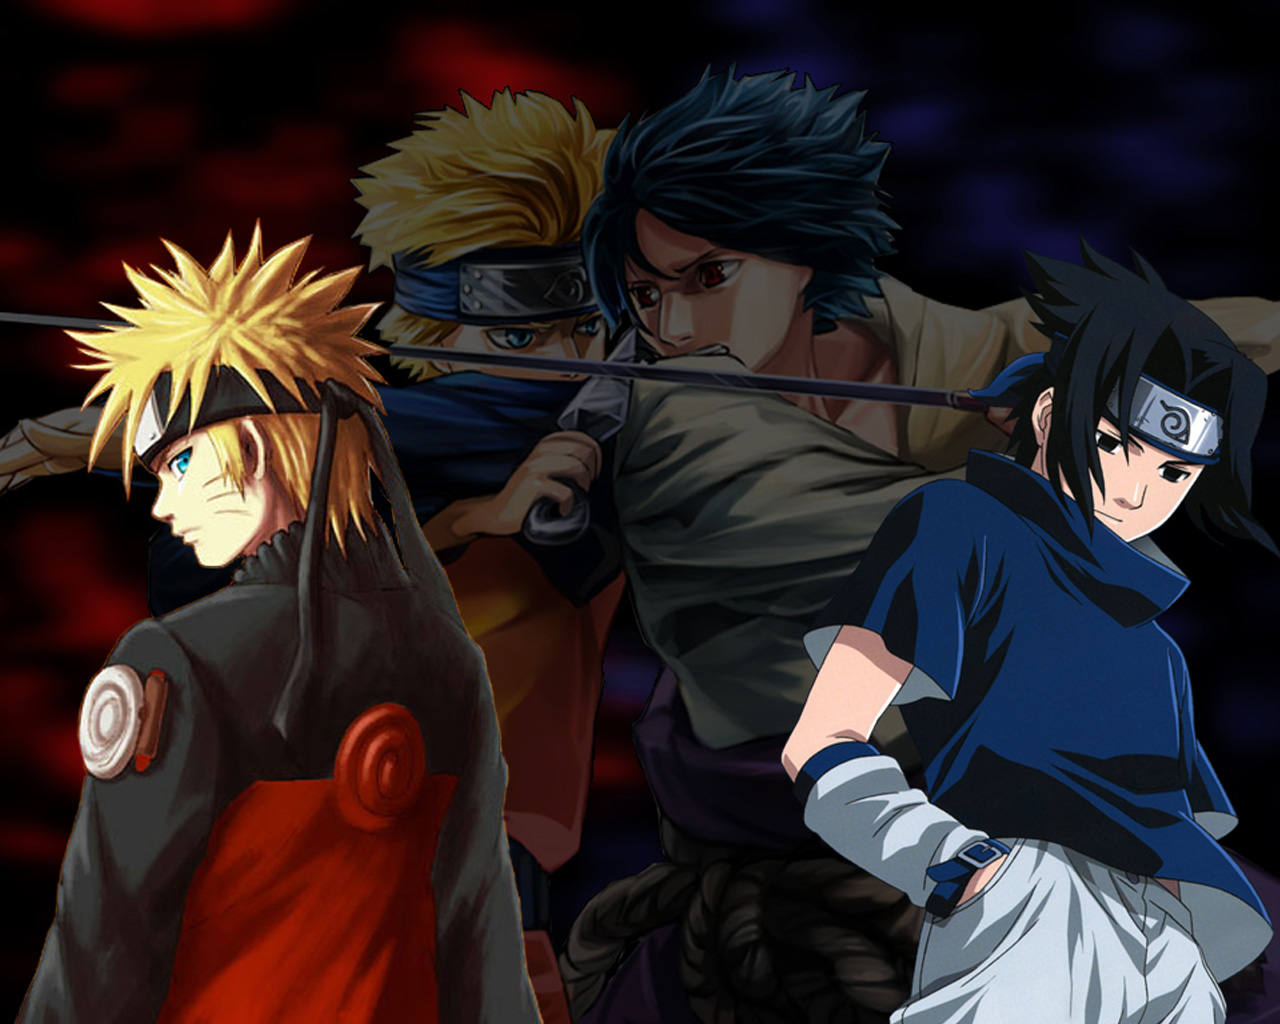 Gallery For > Sasuke Vs Naruto Wallpaper